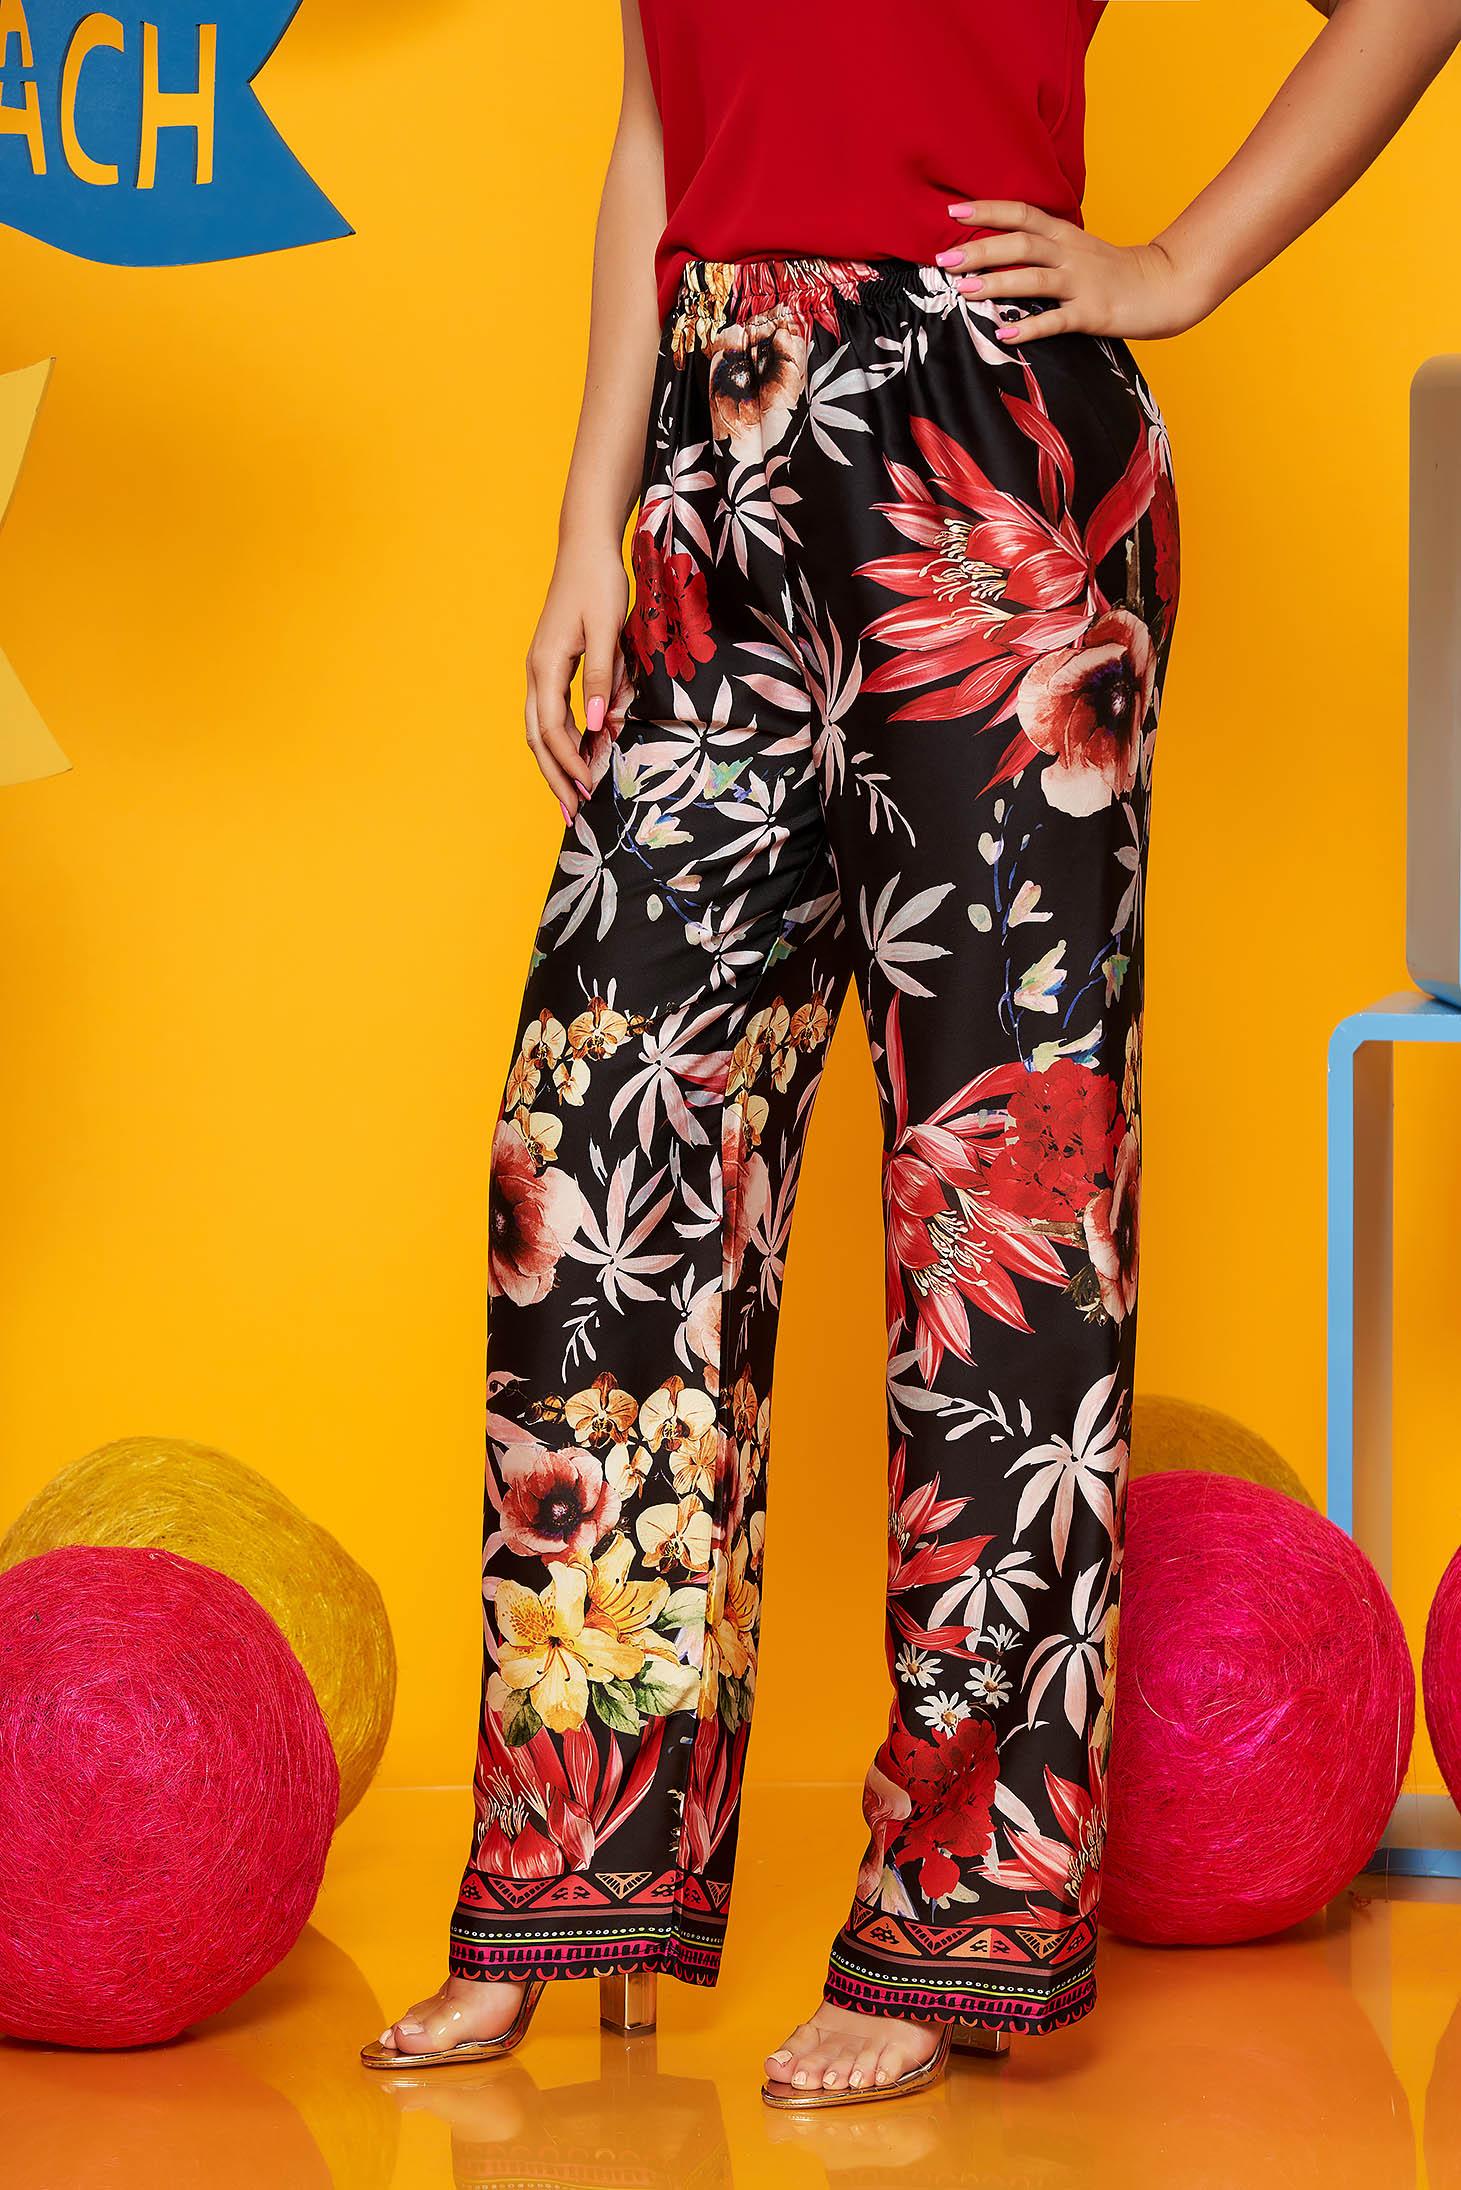 Fekete casual virágmintás magas derekú nadrág